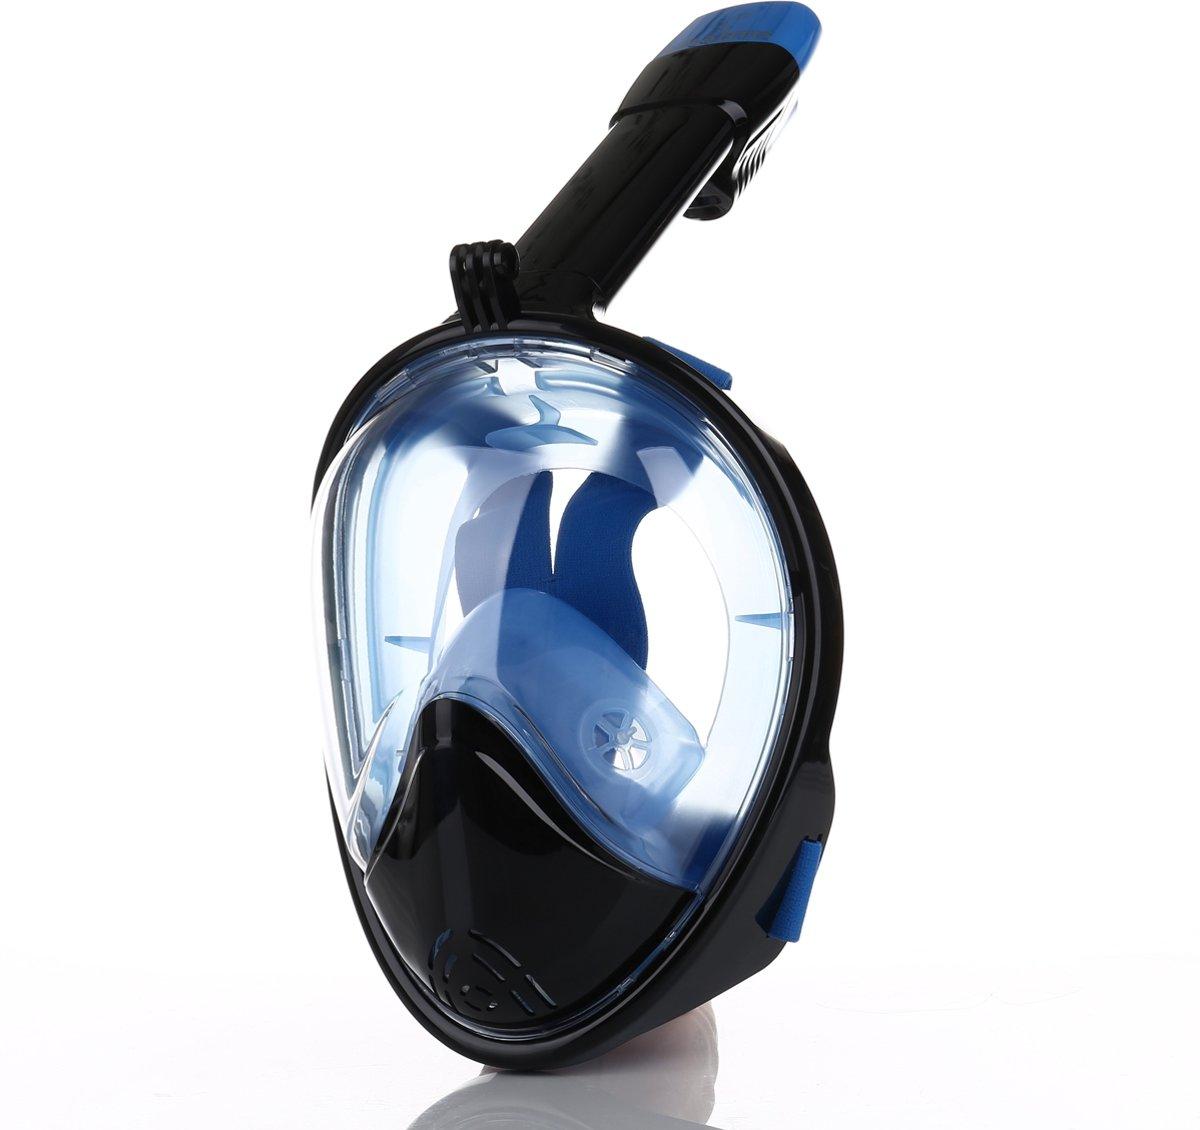 61052effd7f429 bol.com   Atlantis 2.0 Full Face Mask - Snorkelmasker - L/XL - Zwart/Blauw